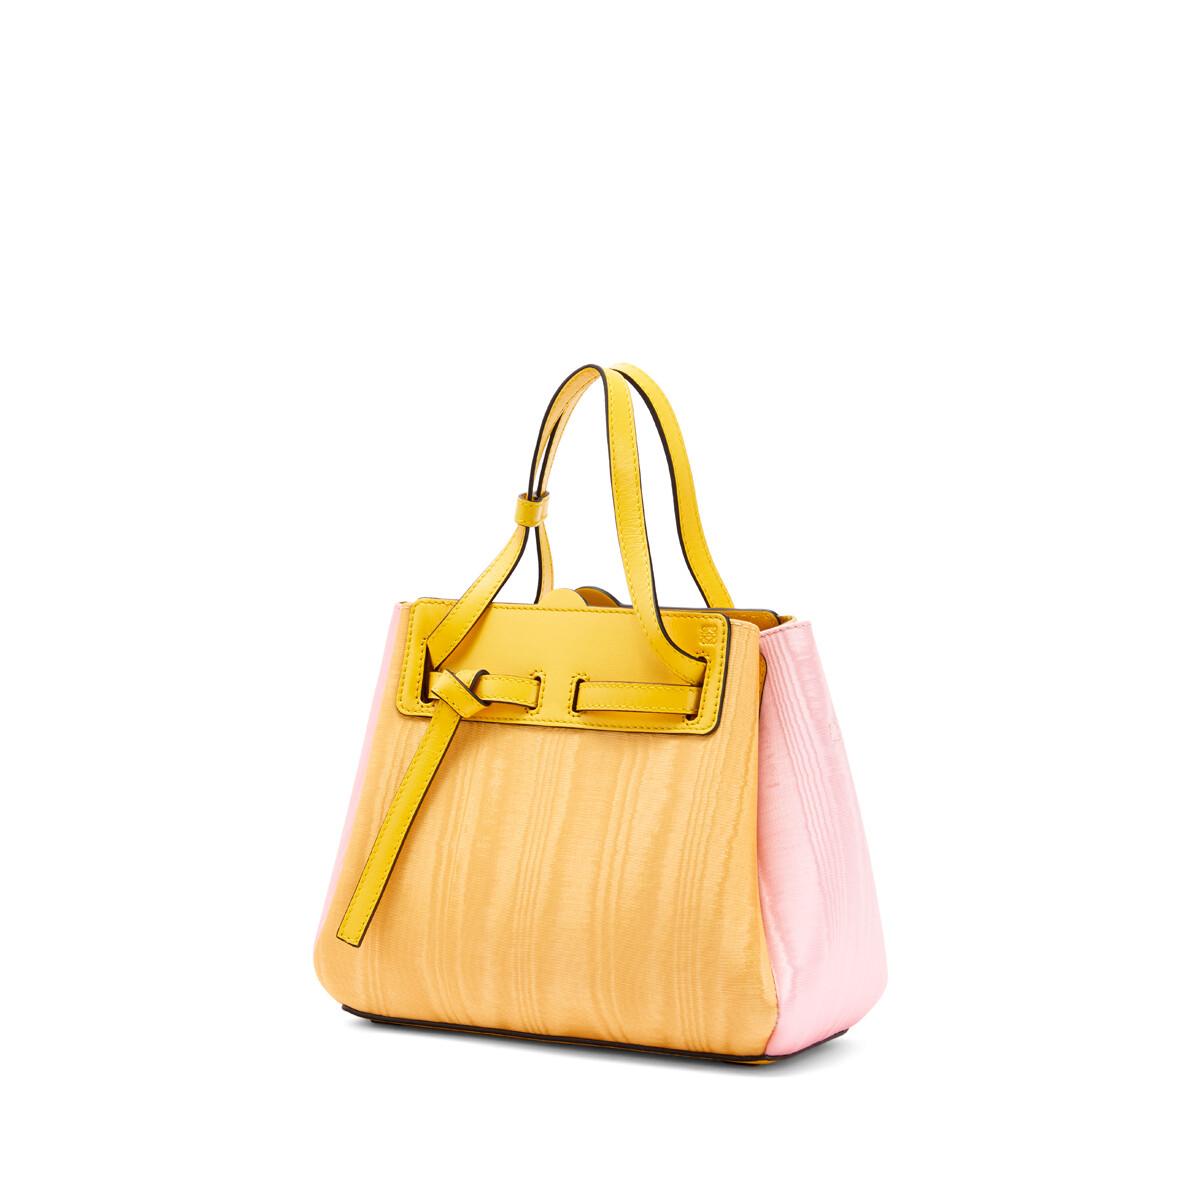 LOEWE Lazo迷你手袋 Yellow/Pink front